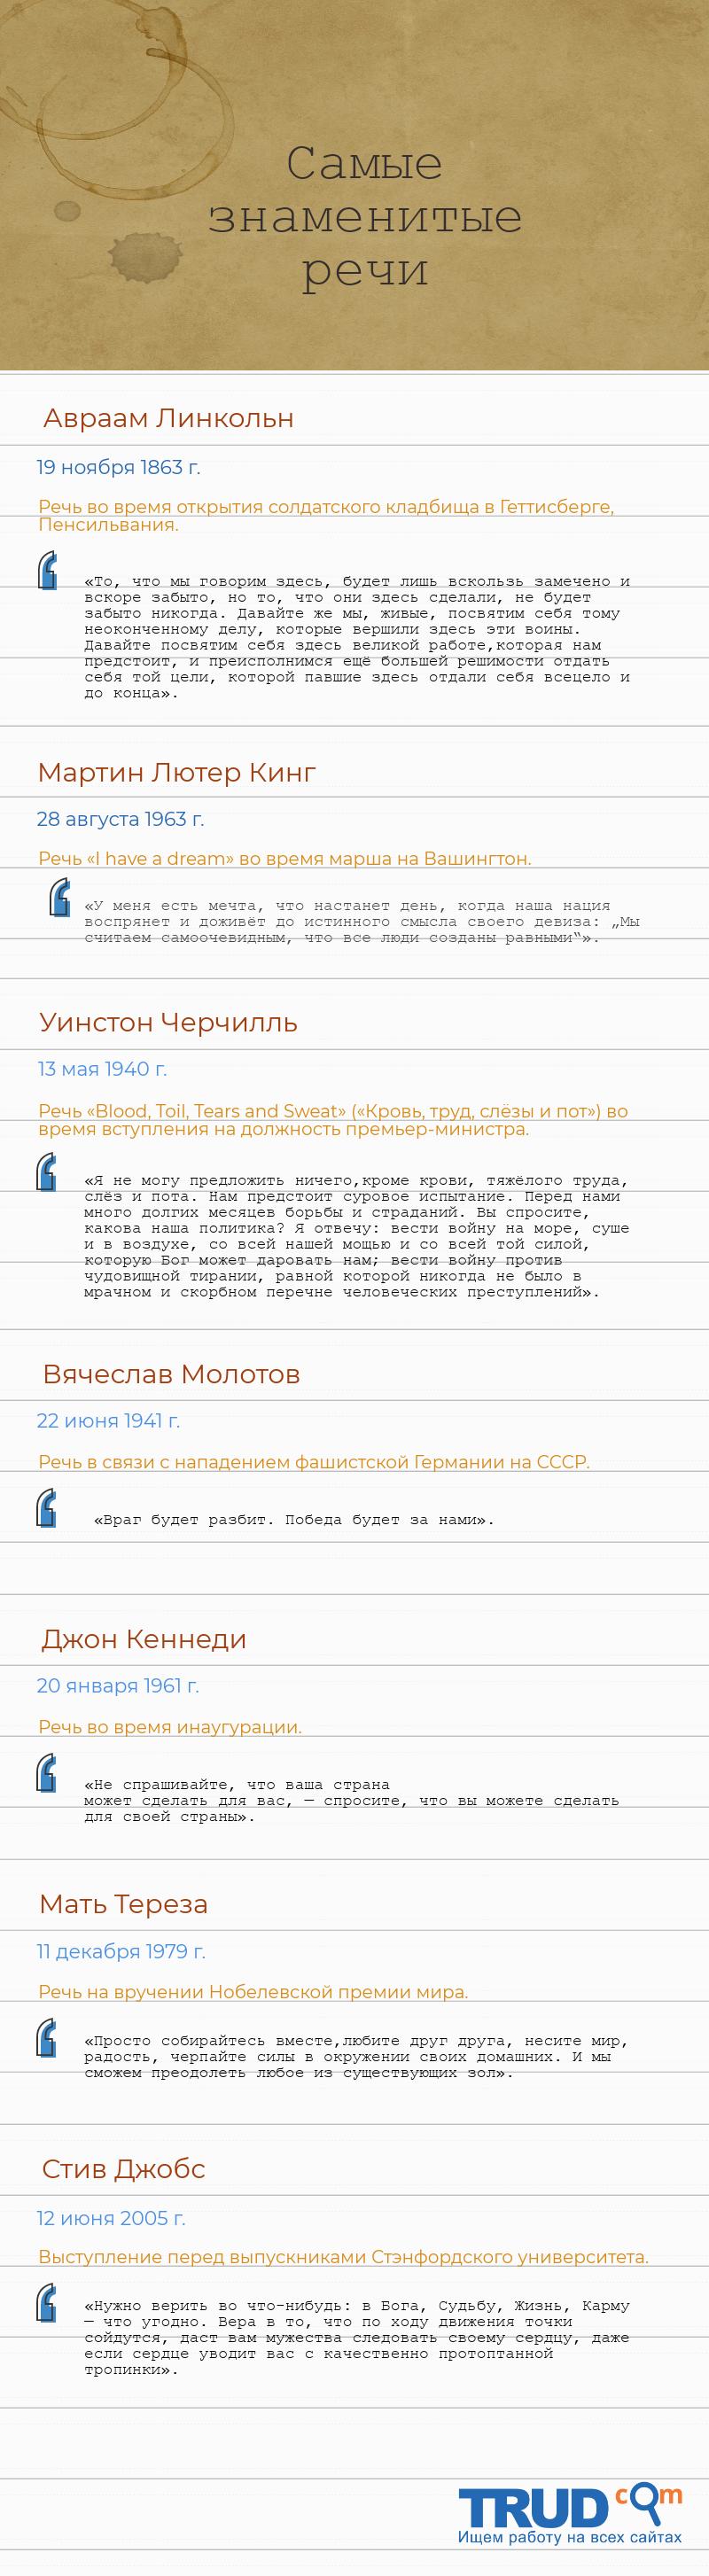 "Инфографика на тему ""Знаменитые речи"""